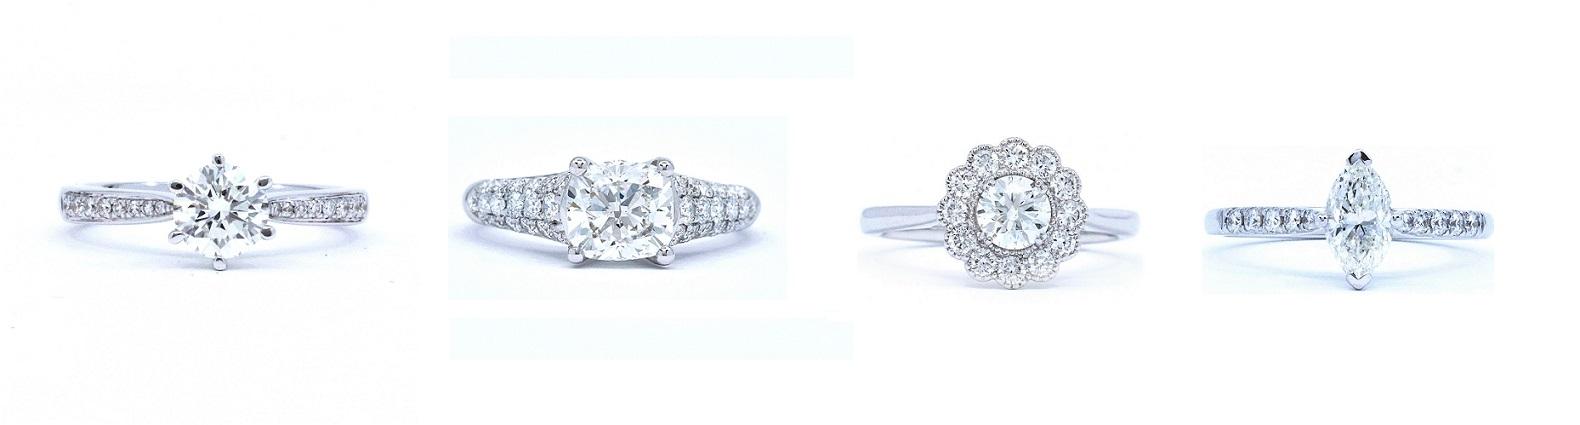 diseños de anillos de compromiso